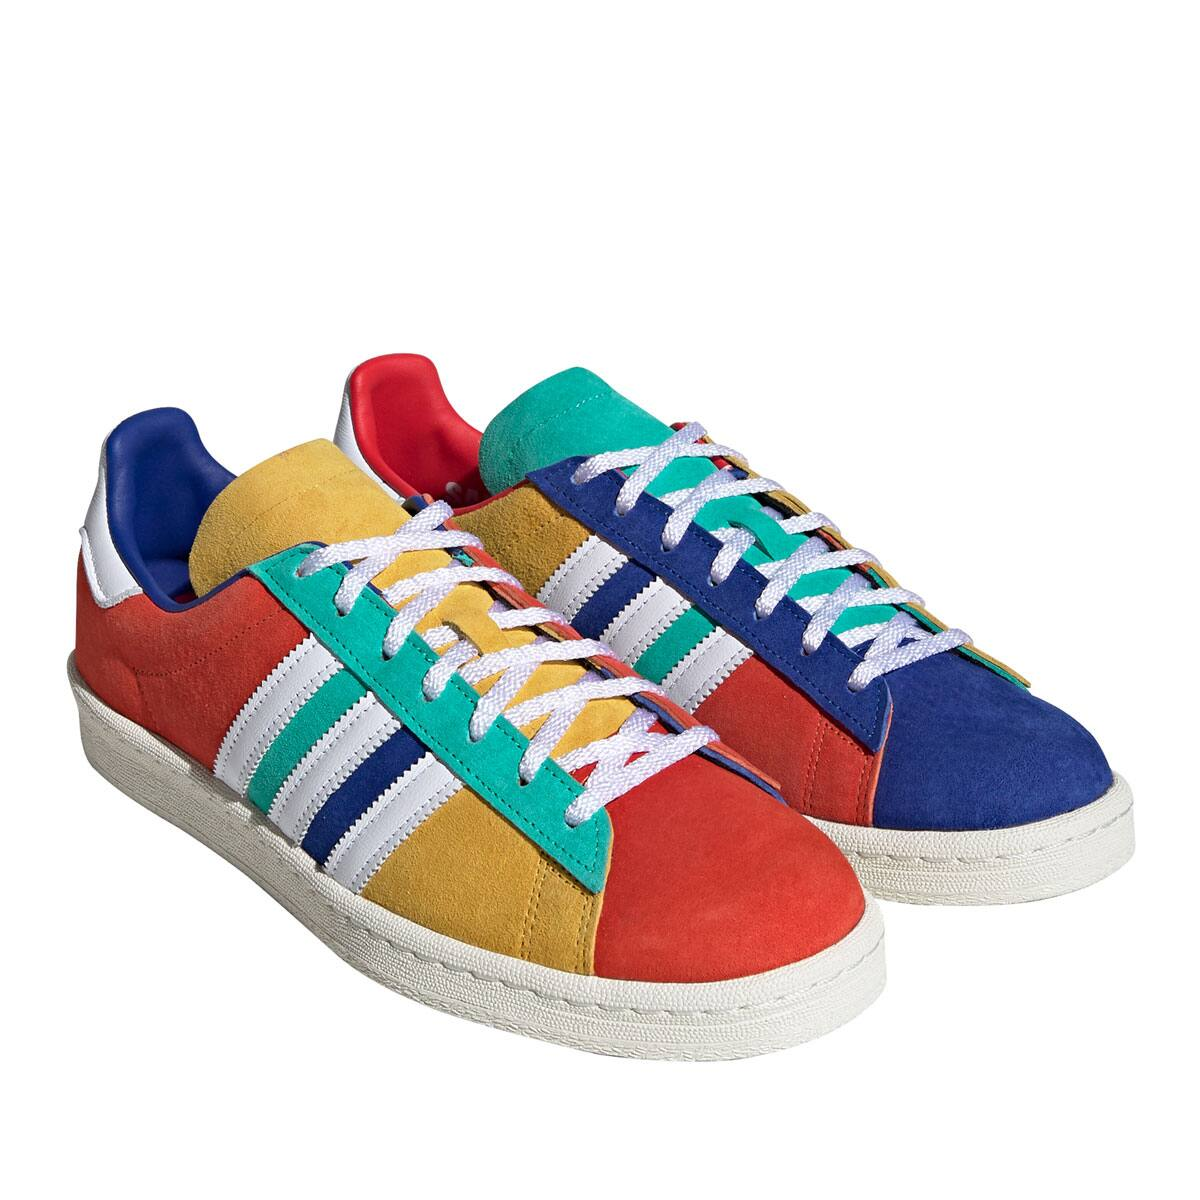 adidas CAMPUS 80s TEAM ROYAL BLUE/FOOTWEAR WHITE/CORE BLACK 20FW-I_photo_large